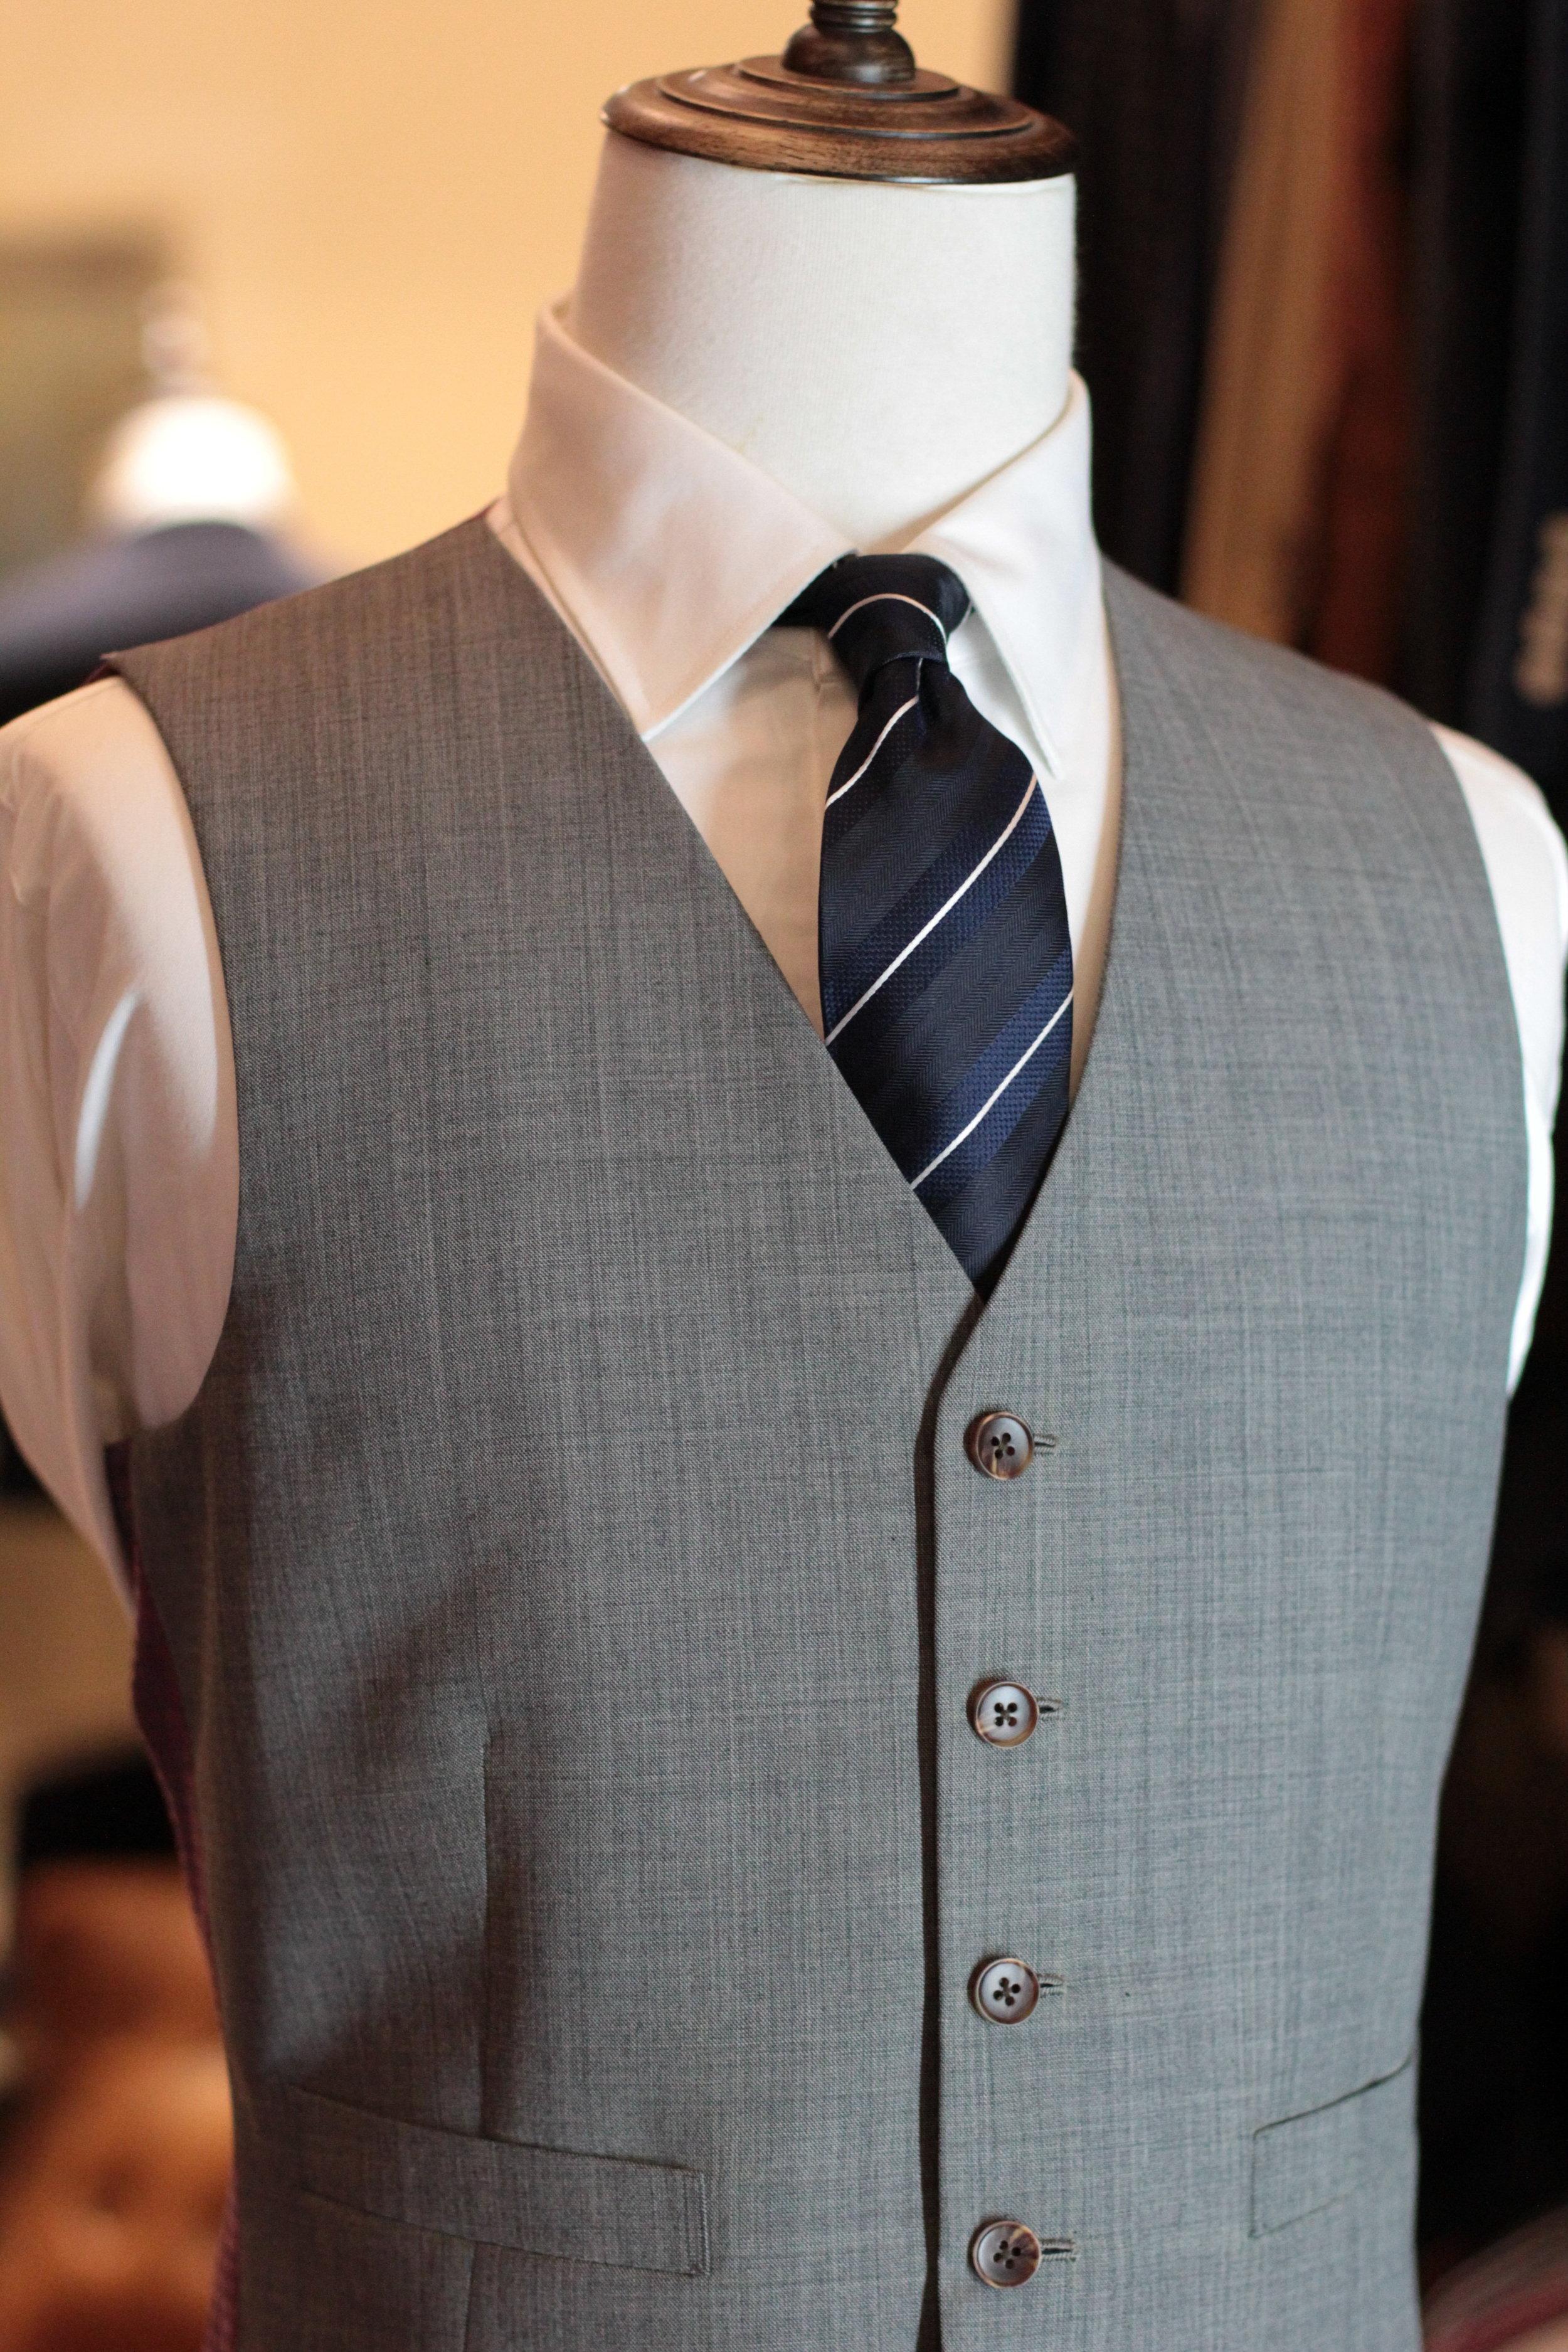 Mr Specter Waistcoat   vest   Made Suits   tailor made suits   Singapore tailor   bespoke   tailored suit.JPG